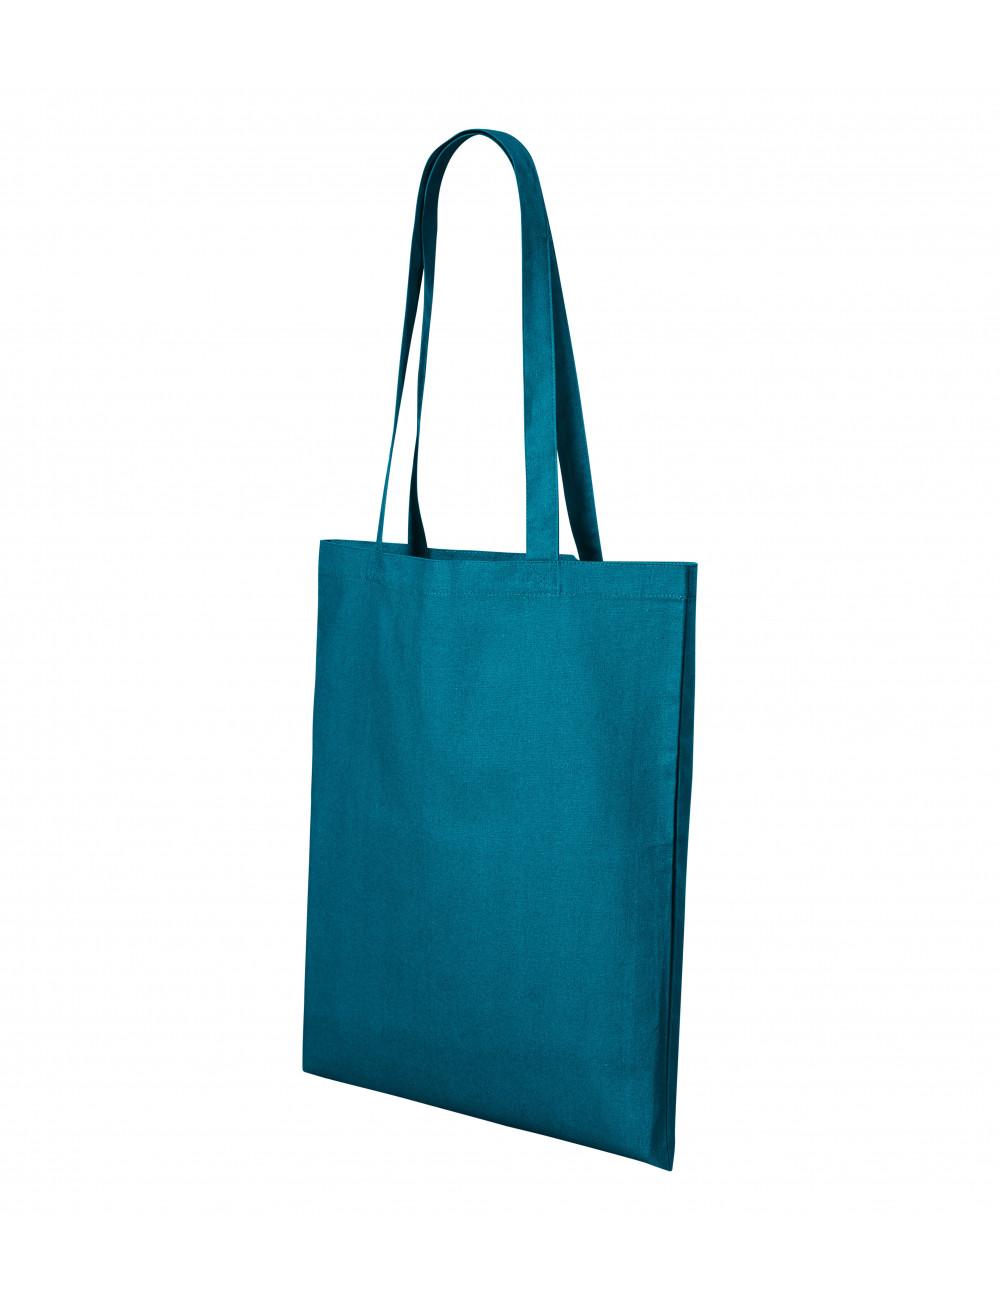 Adler MALFINI Torba na zakupy unisex Shopper 921 petrol blue